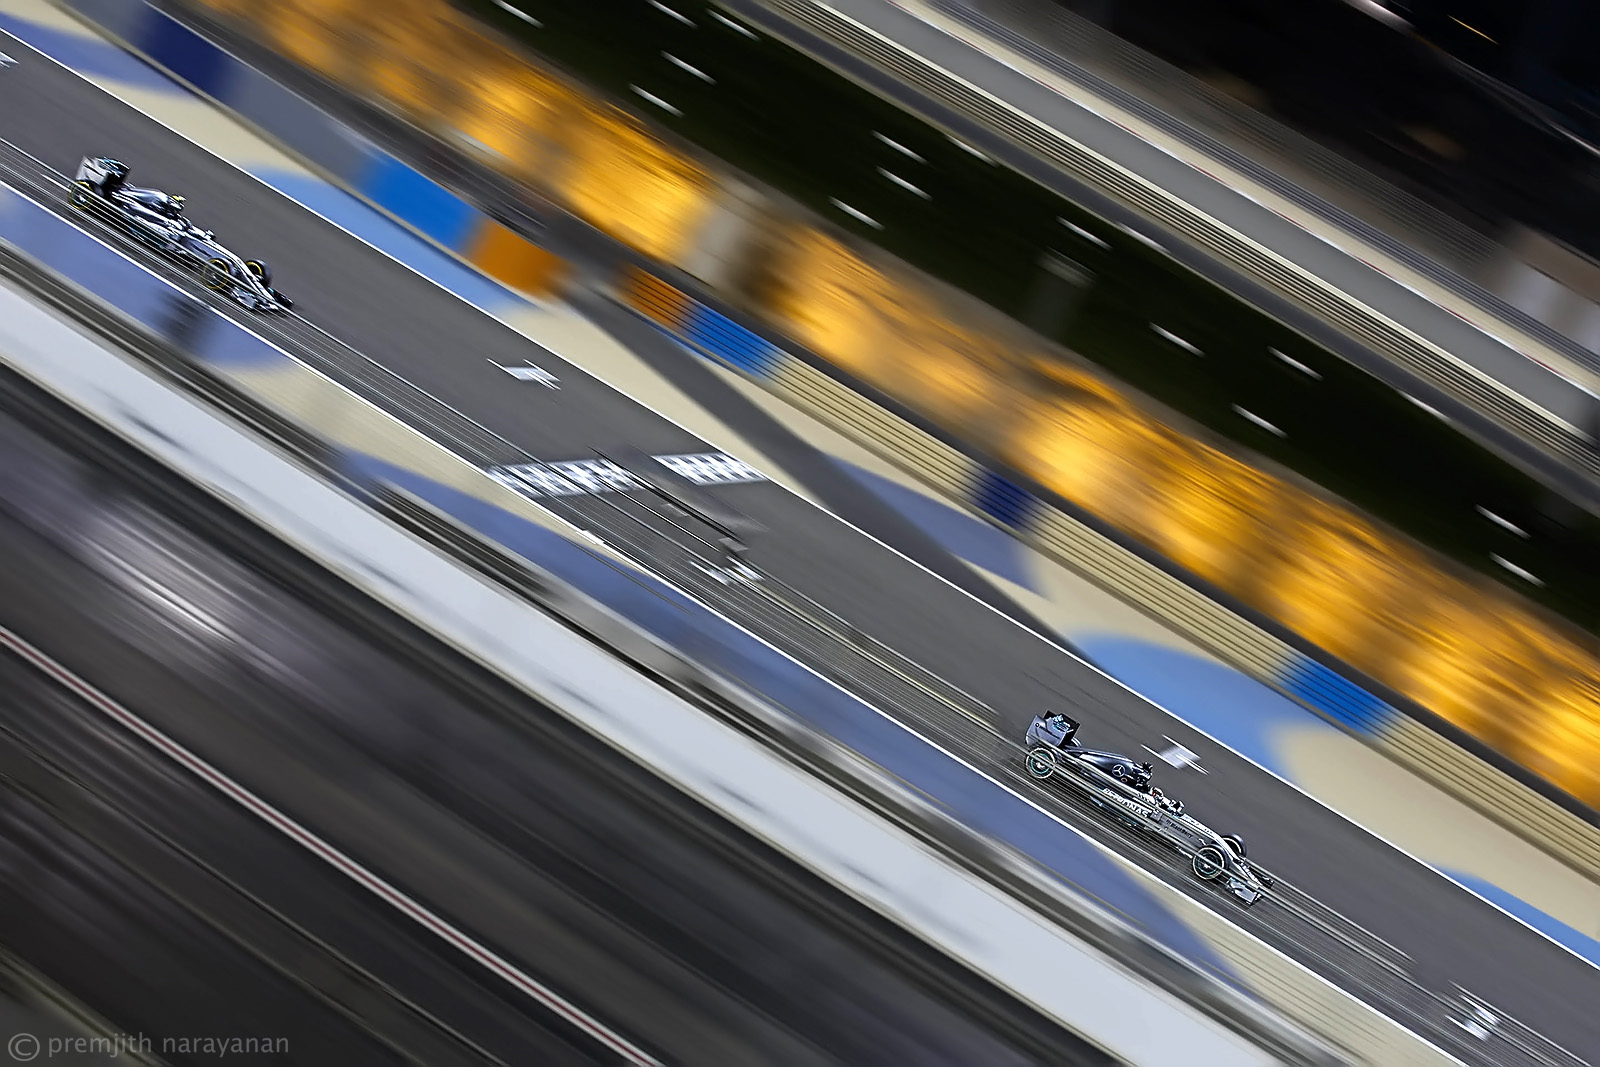 Lewis Hamilton & Nico Roseberg, MERCEDES AMG Petronas